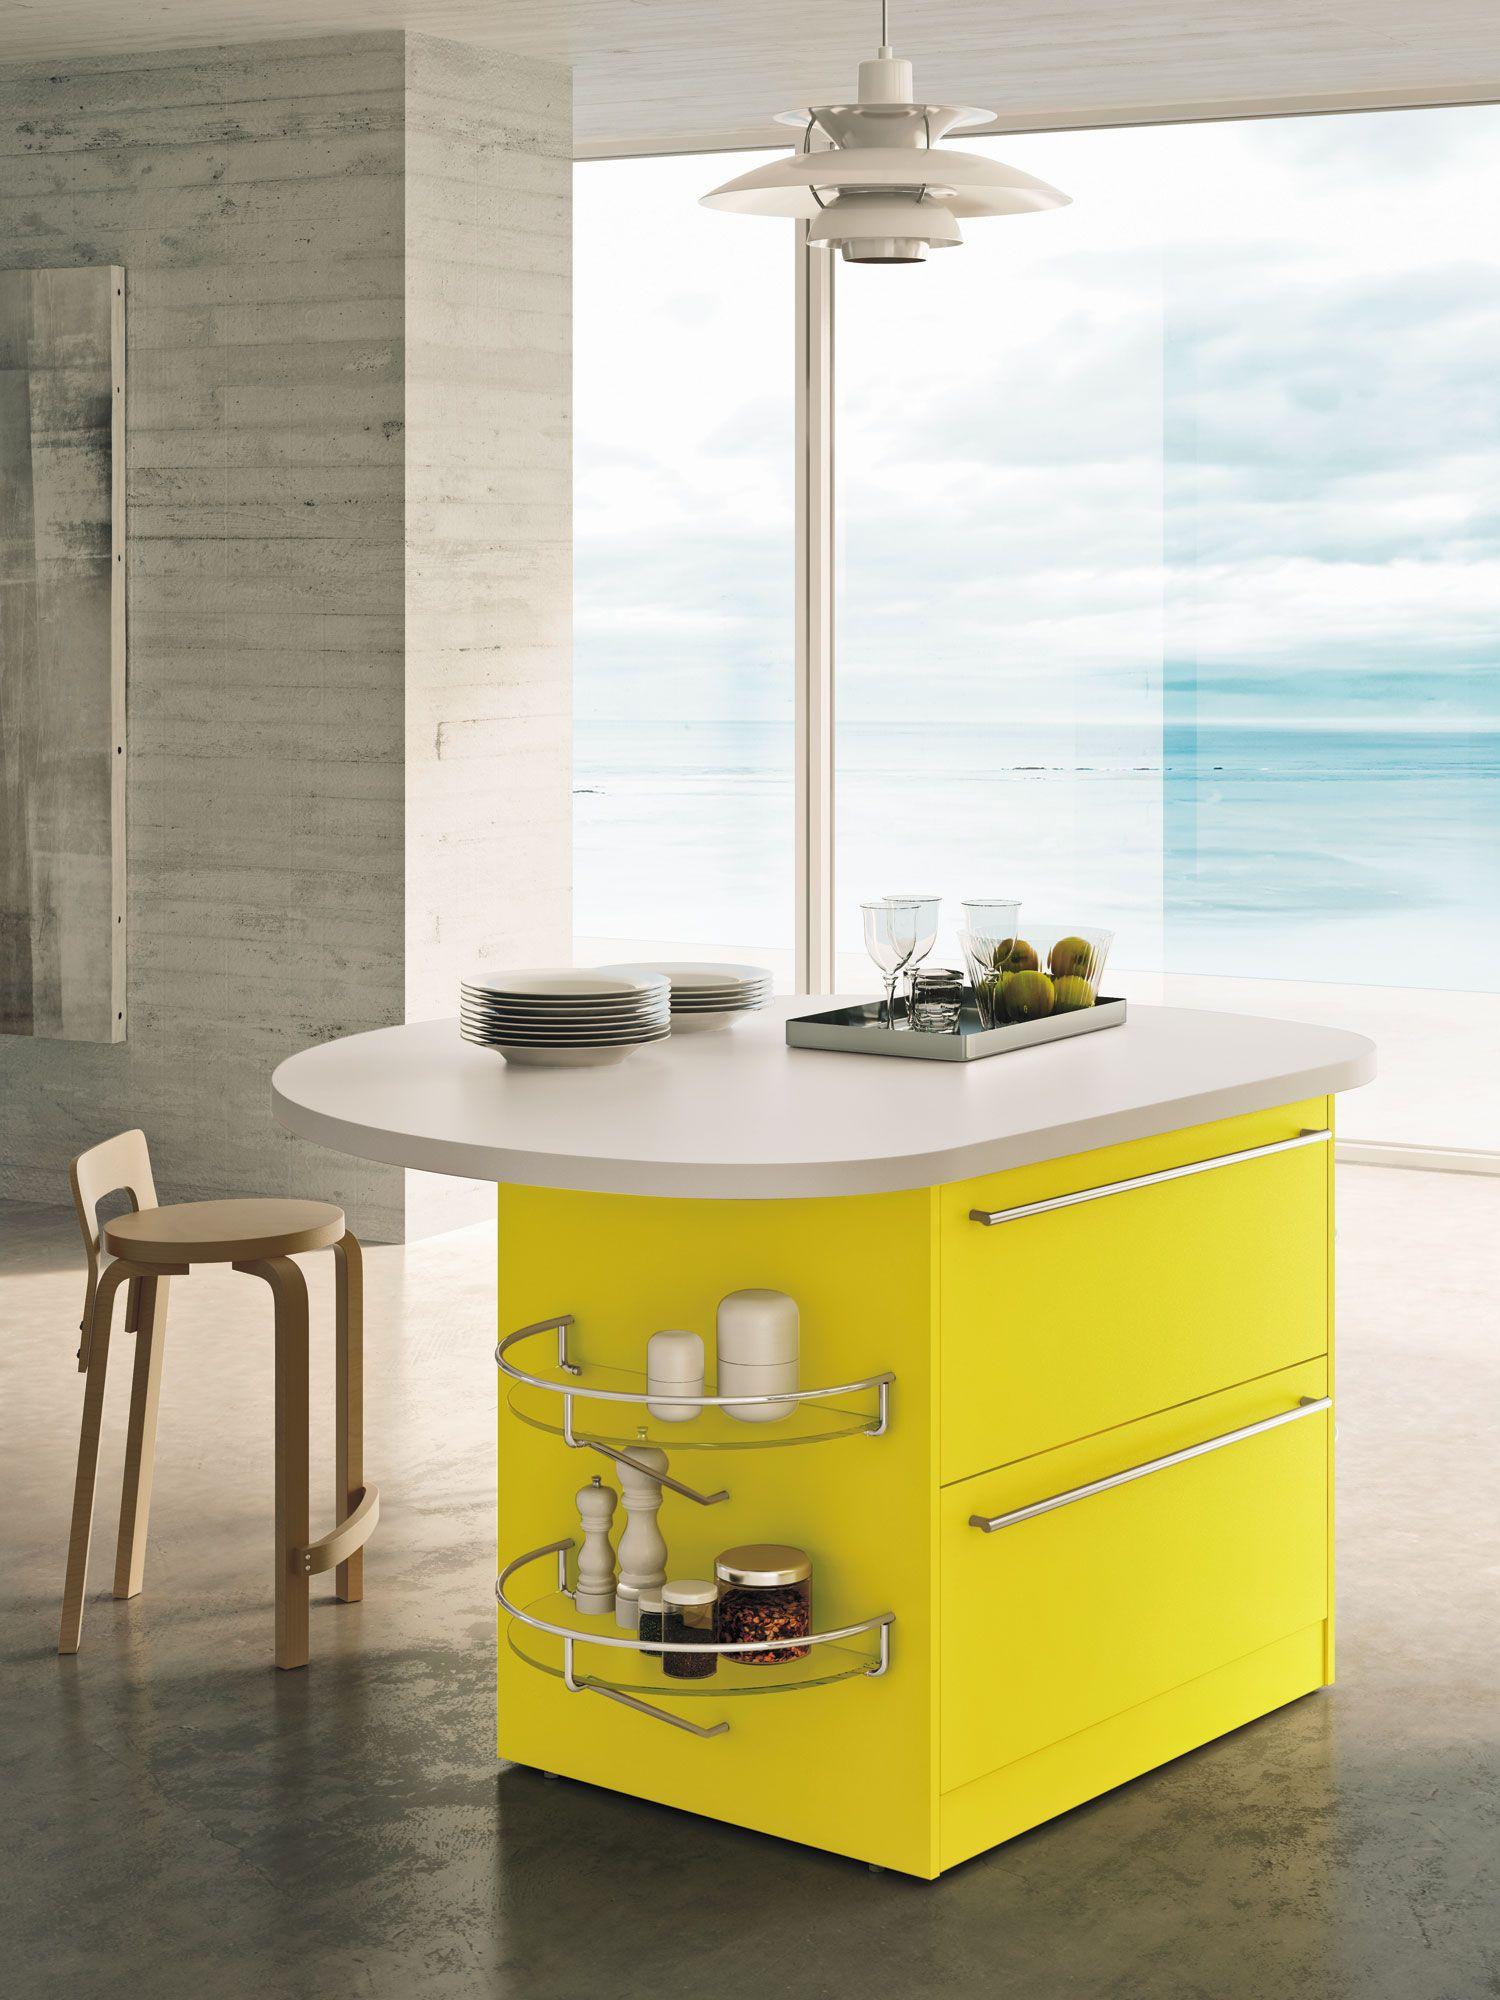 cucina moderna skyline 2.0 | Snaidero SKYLINE Kitchens | Pinterest ...